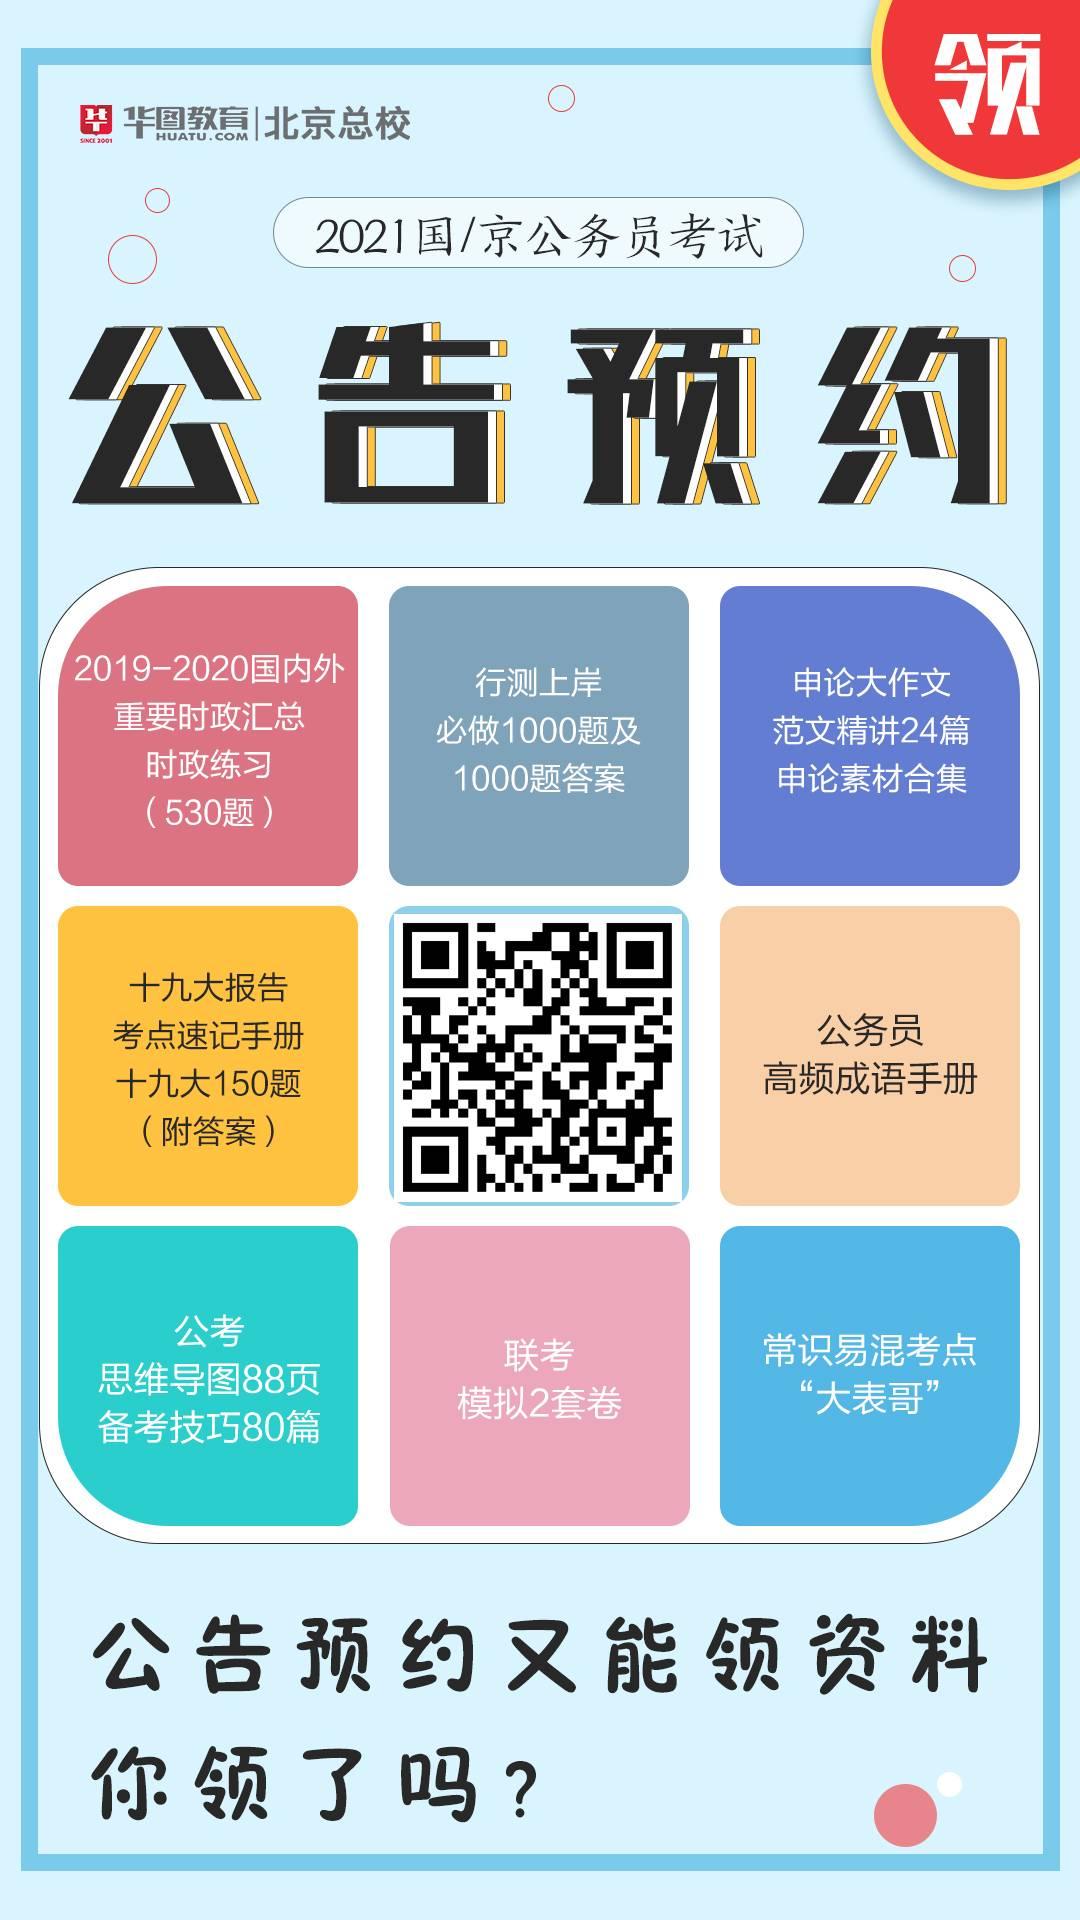 http://www.kmshsm.com/wenhuayichan/59795.html